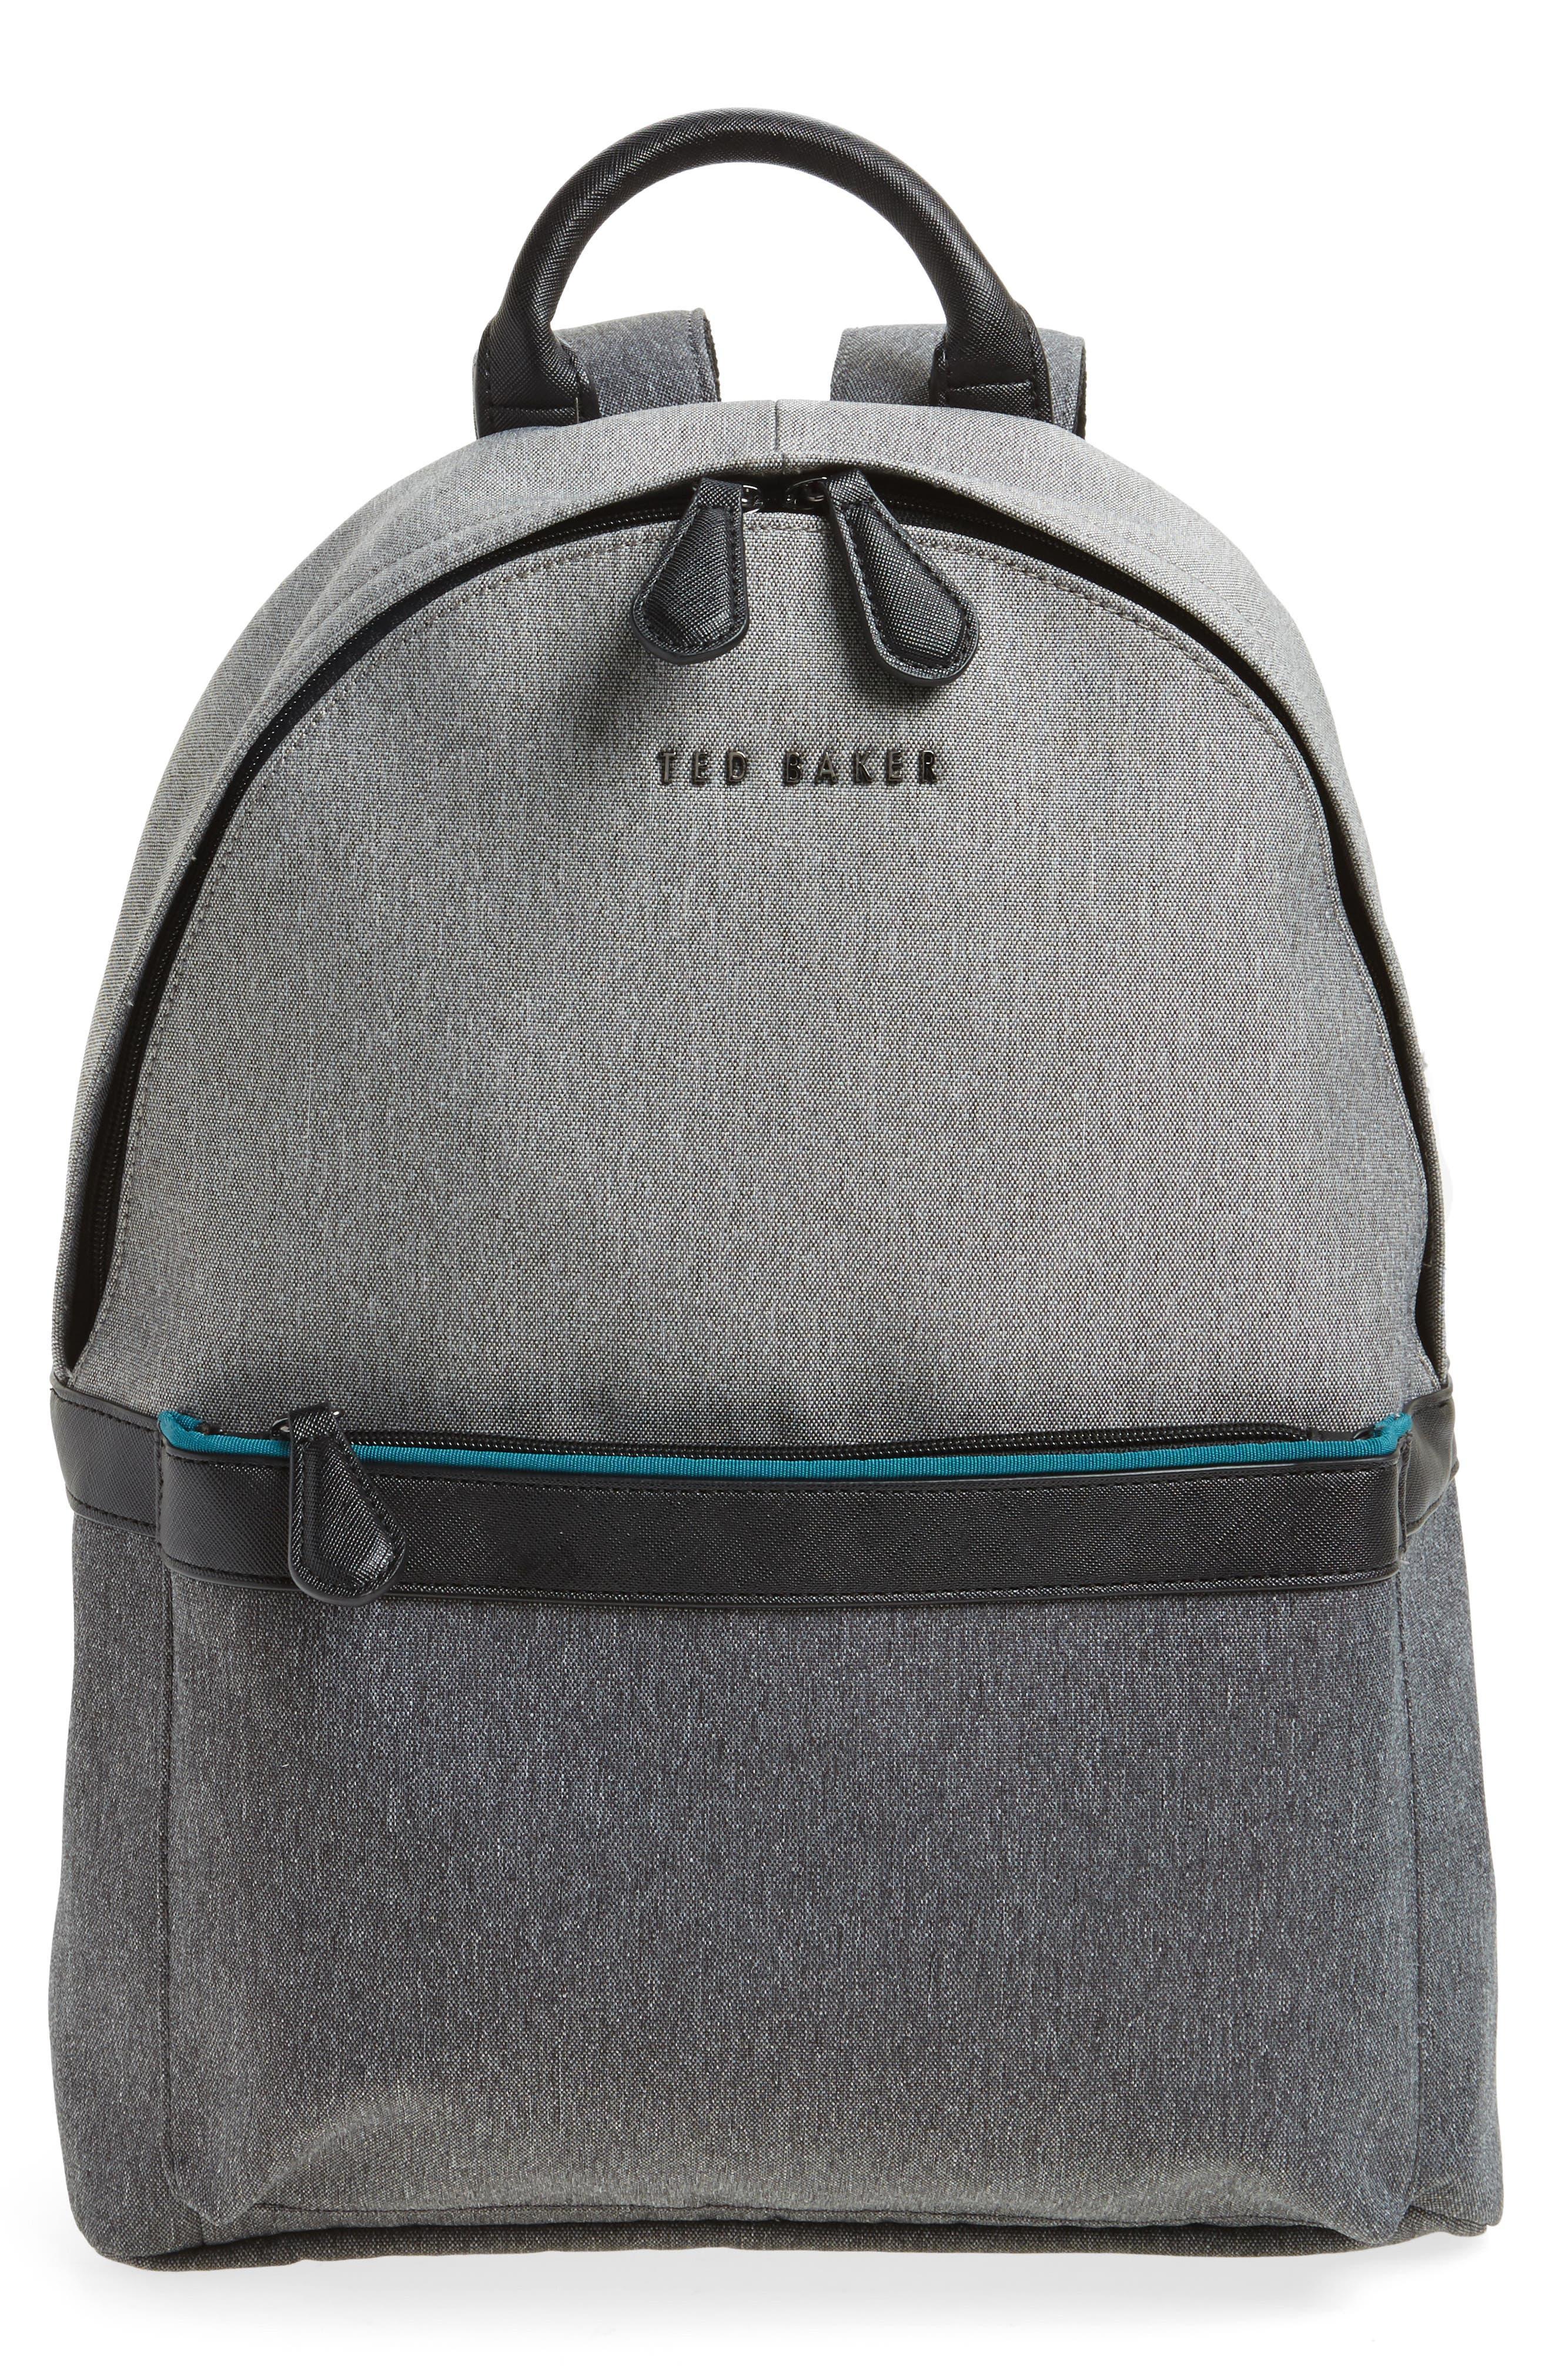 Zirabi Backpack,                             Main thumbnail 1, color,